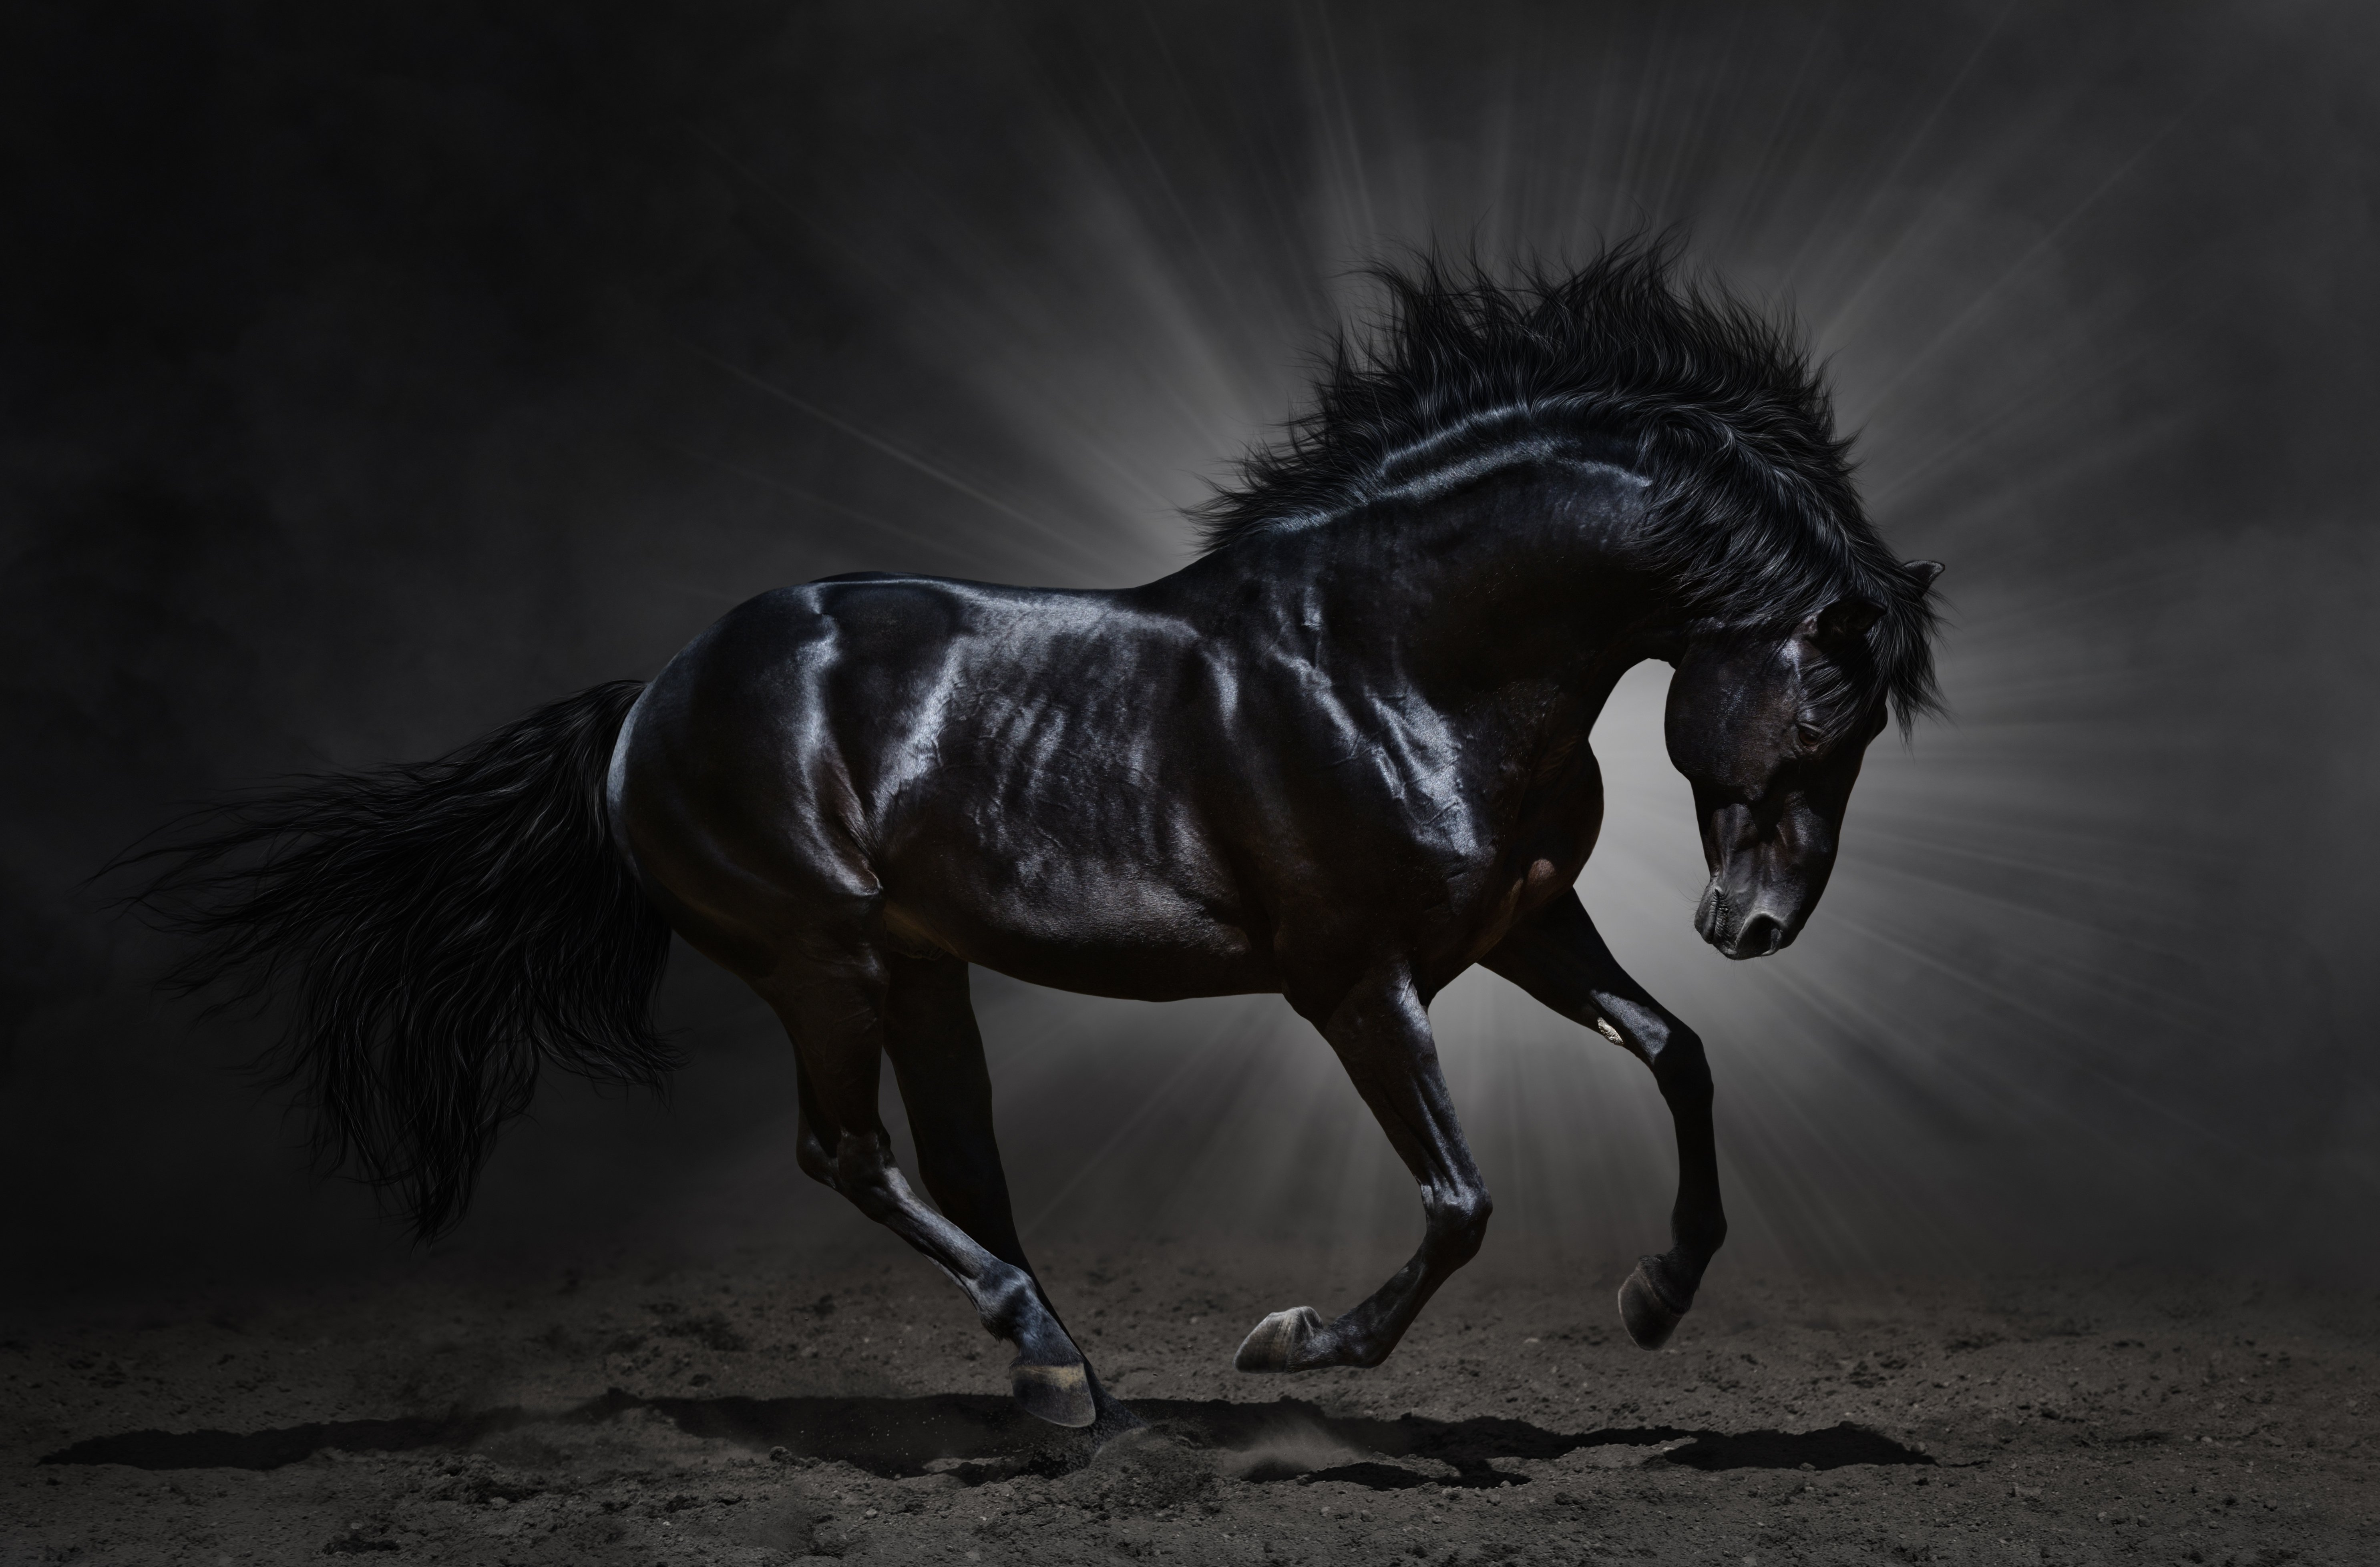 Black horses running at night - photo#24